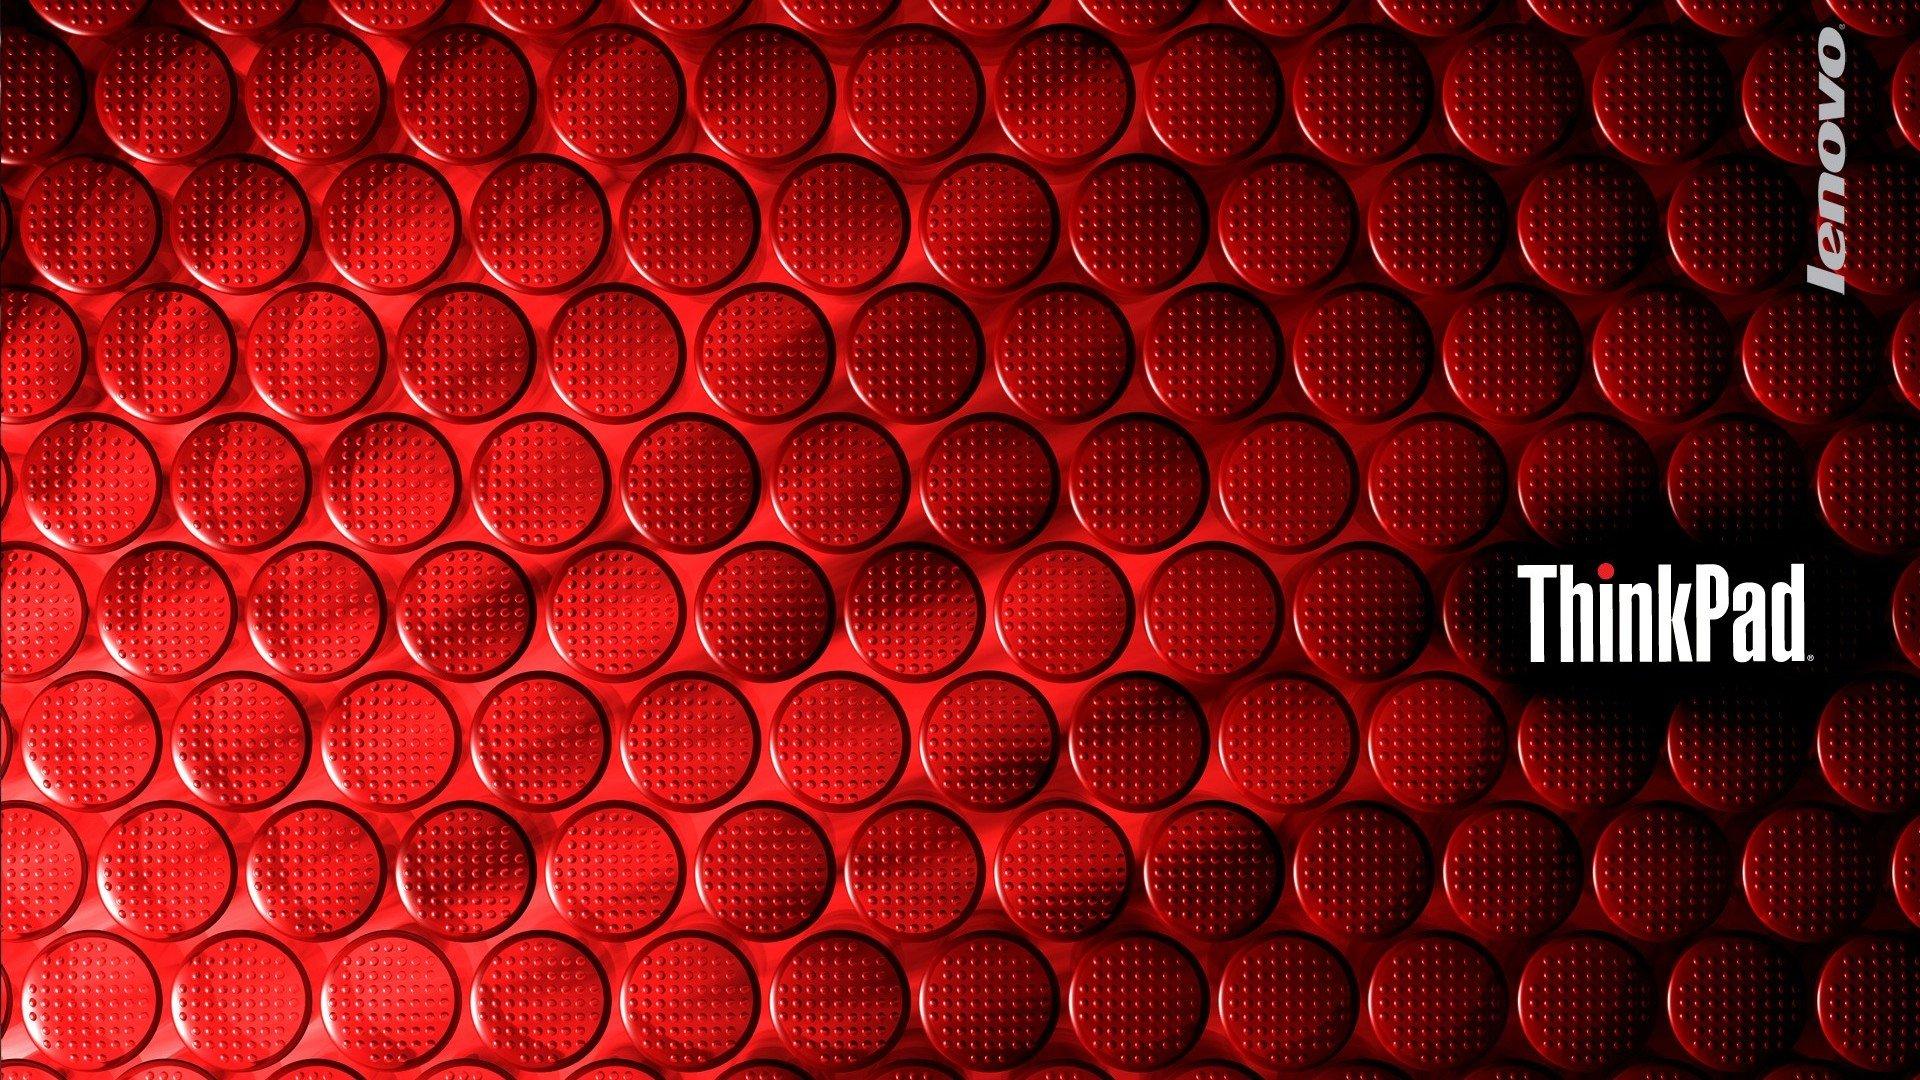 LENOVO computer wallpaper 1920x1080 421189 WallpaperUP 1920x1080